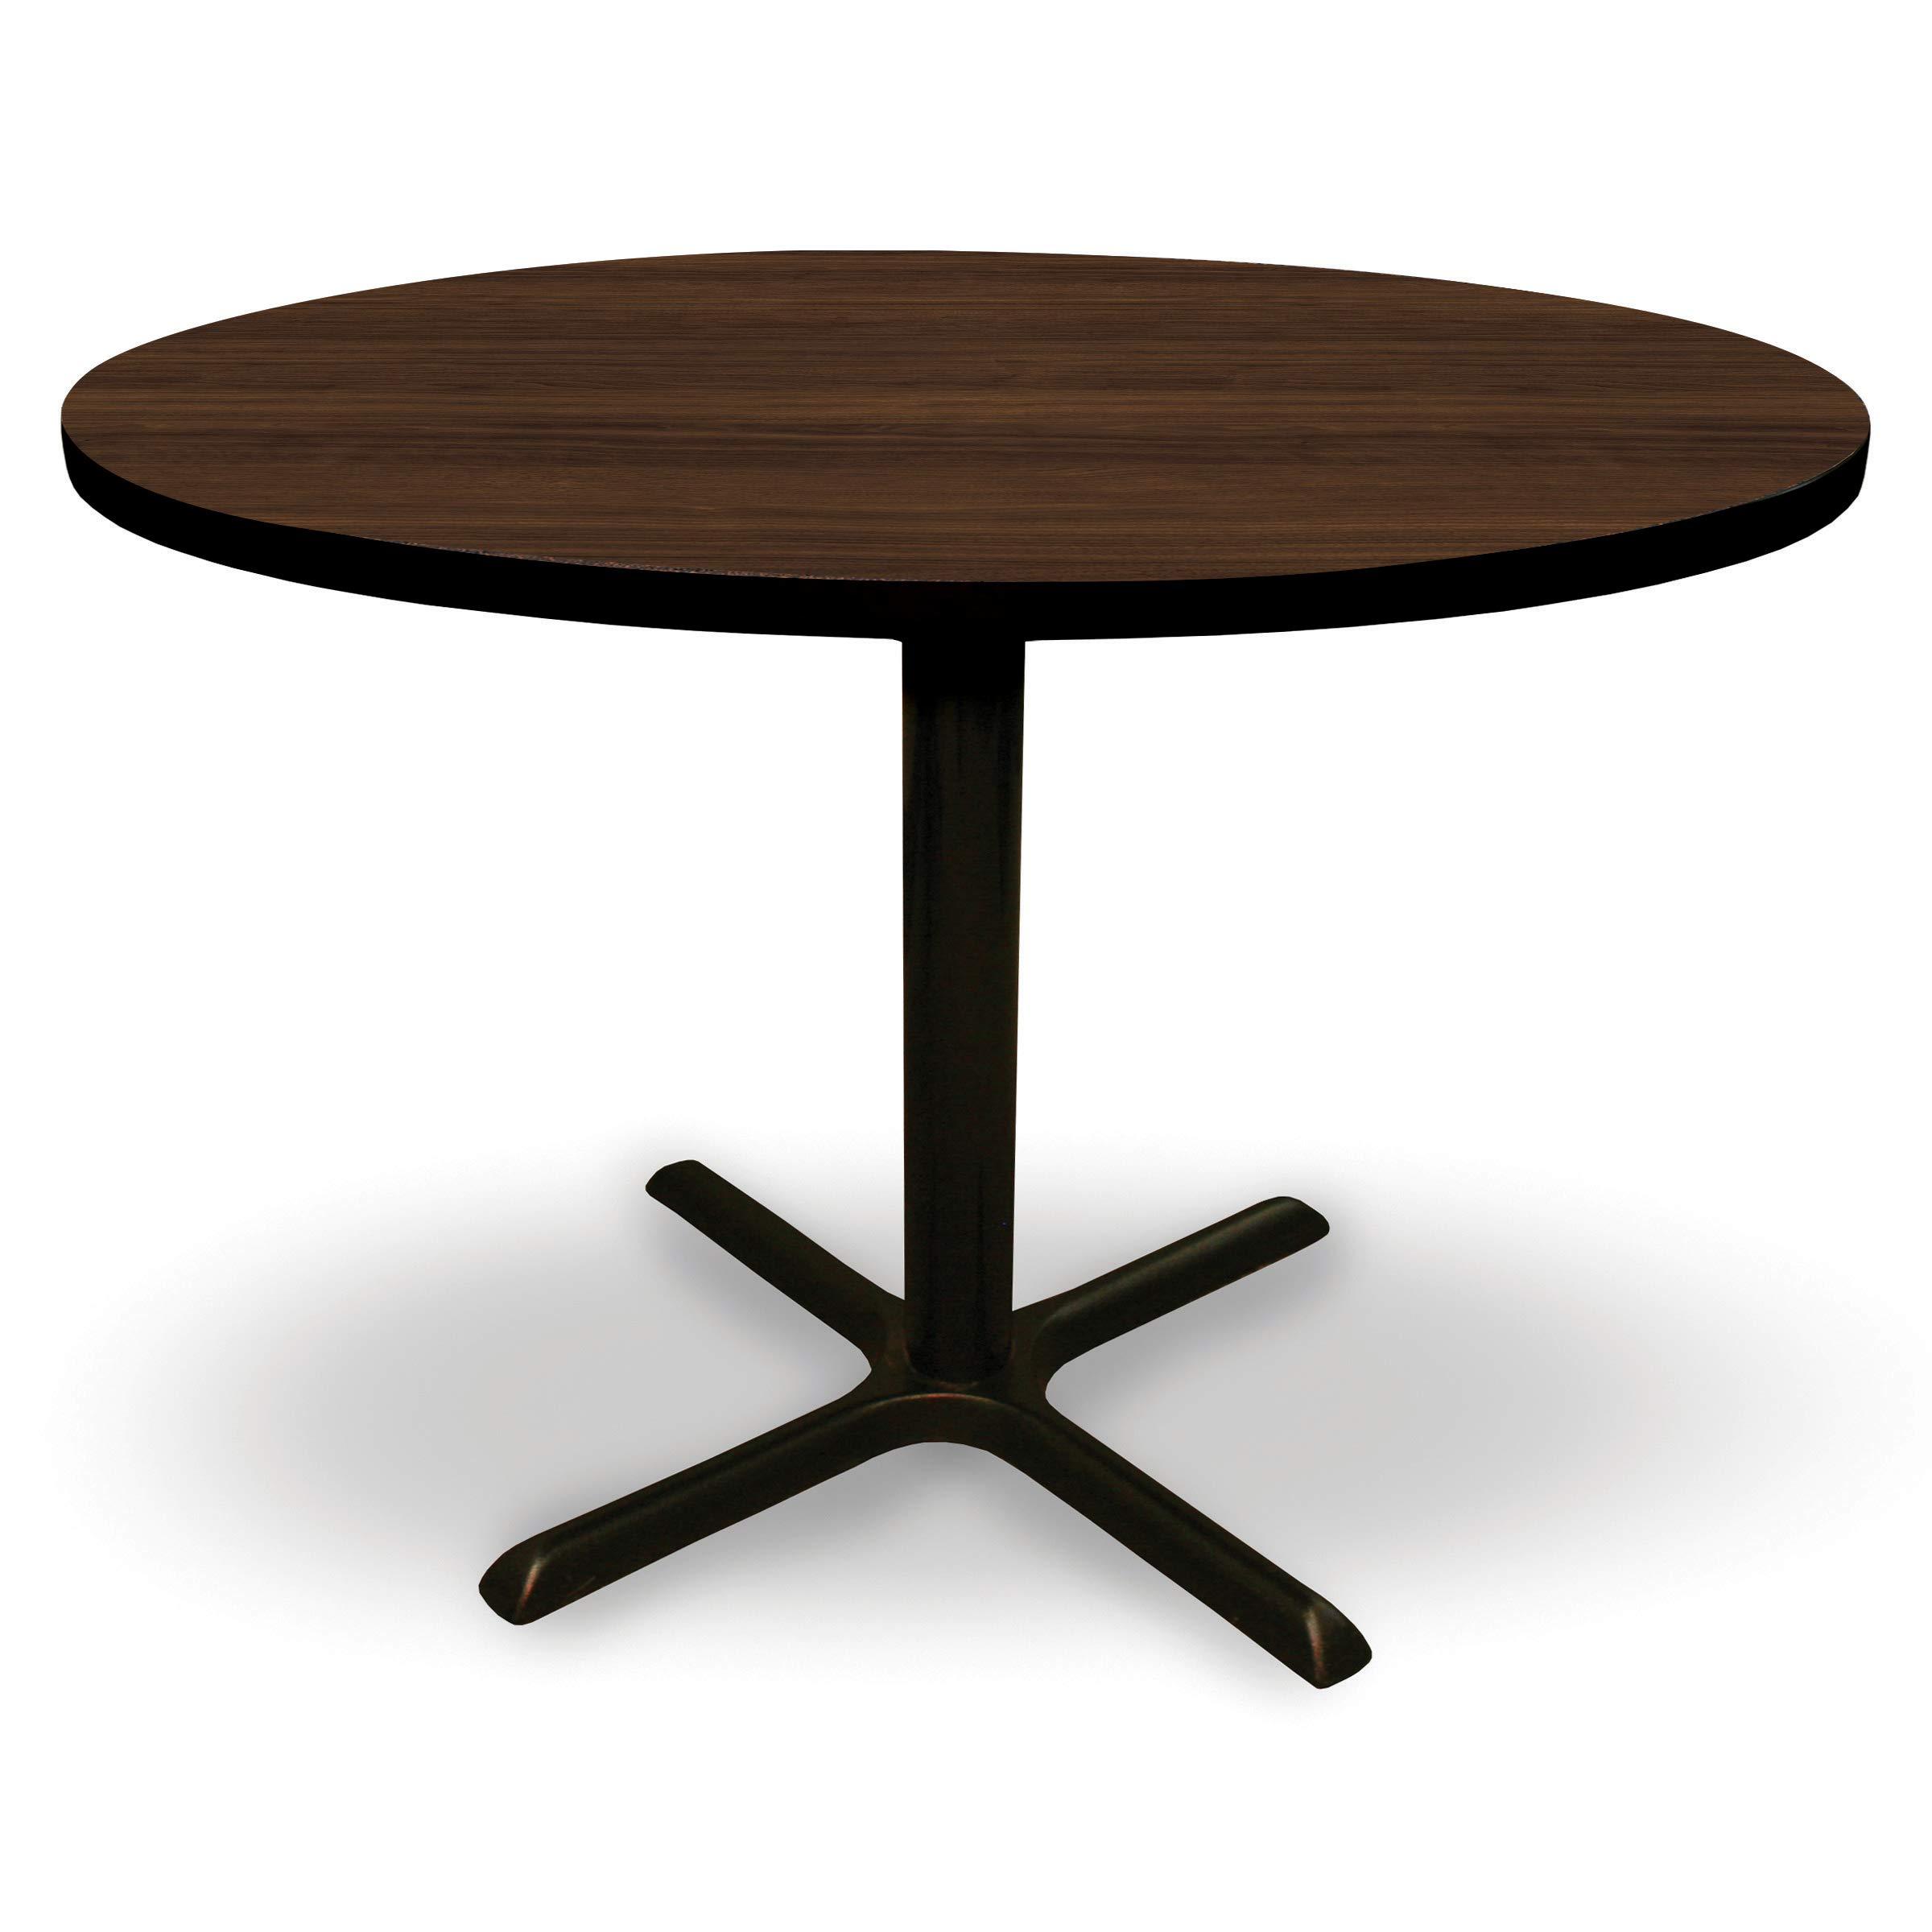 AMOF 48'' Round Conference, Break Room, Multipurpose Table - Walnut Laminate/Black Finish